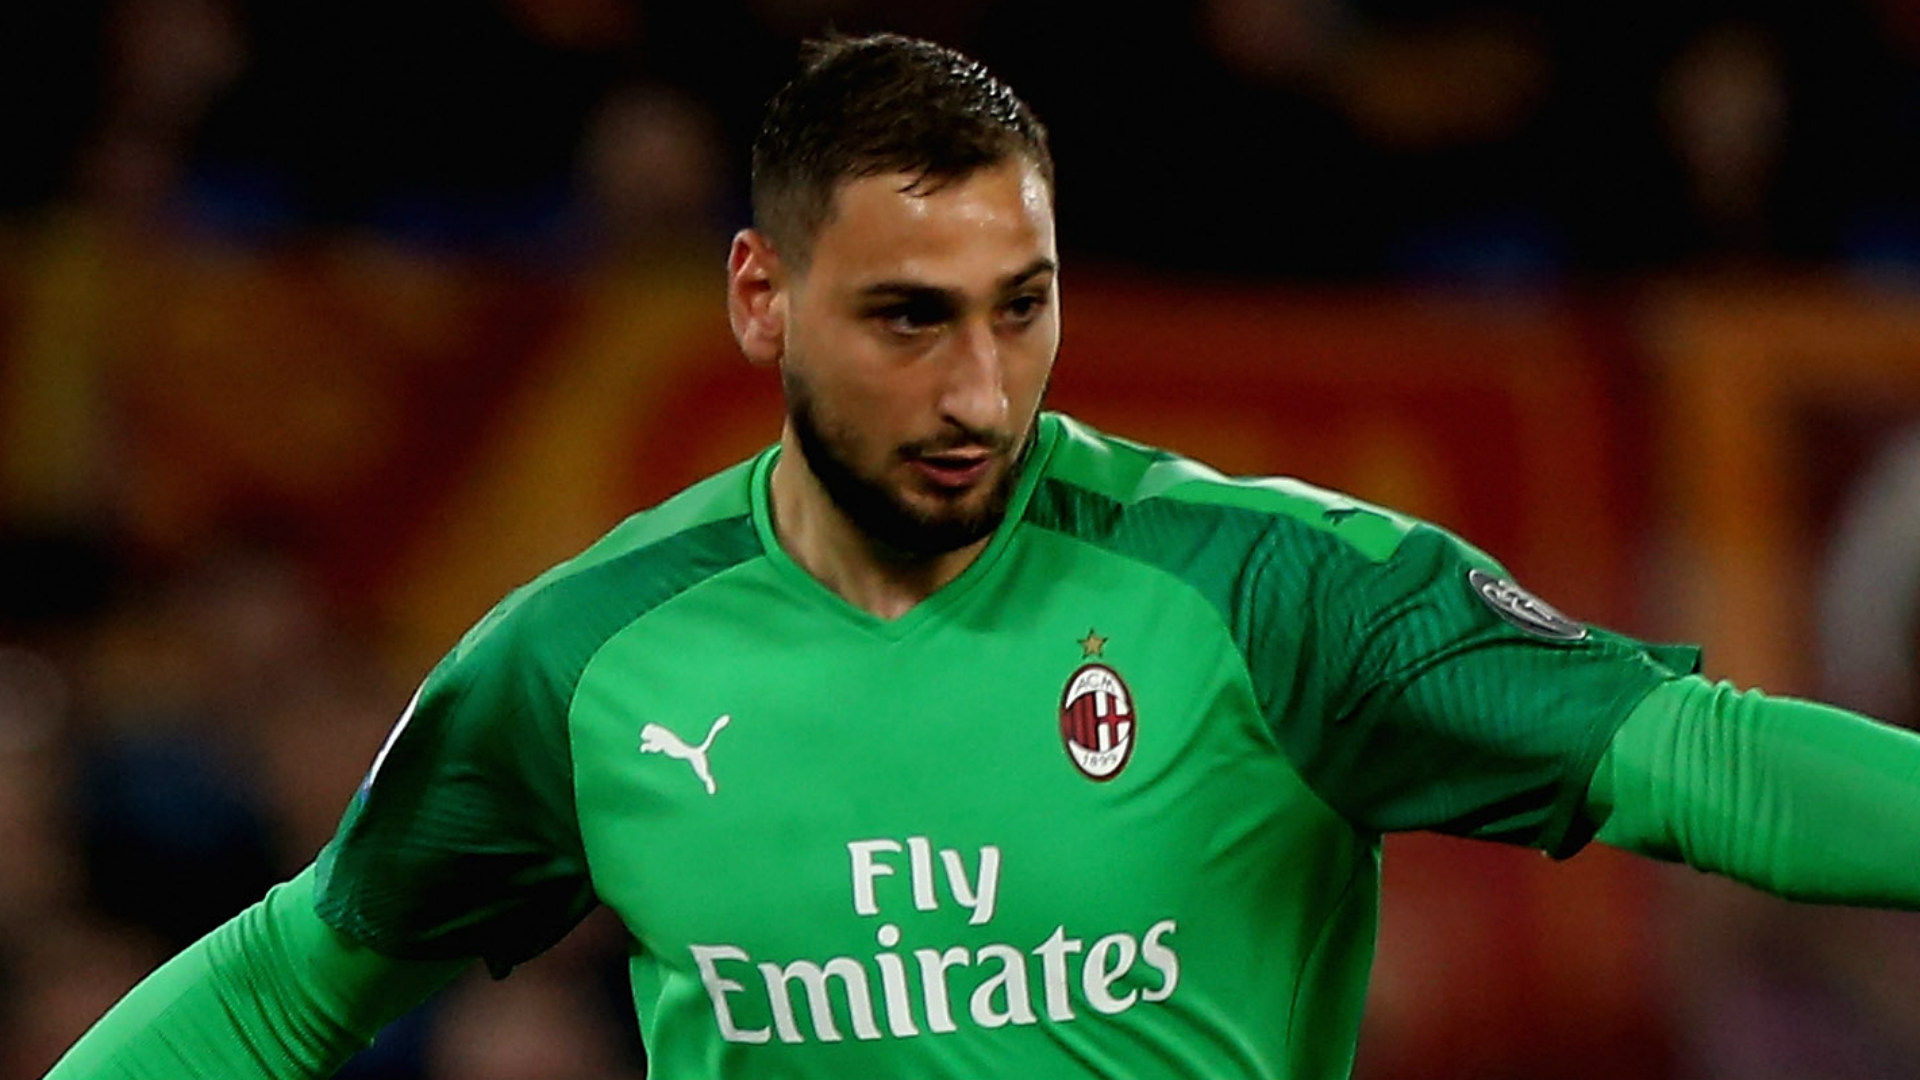 Milan, la Juve torna su Donnarumma: ecco l'offerta dei bianconeri a Raiola